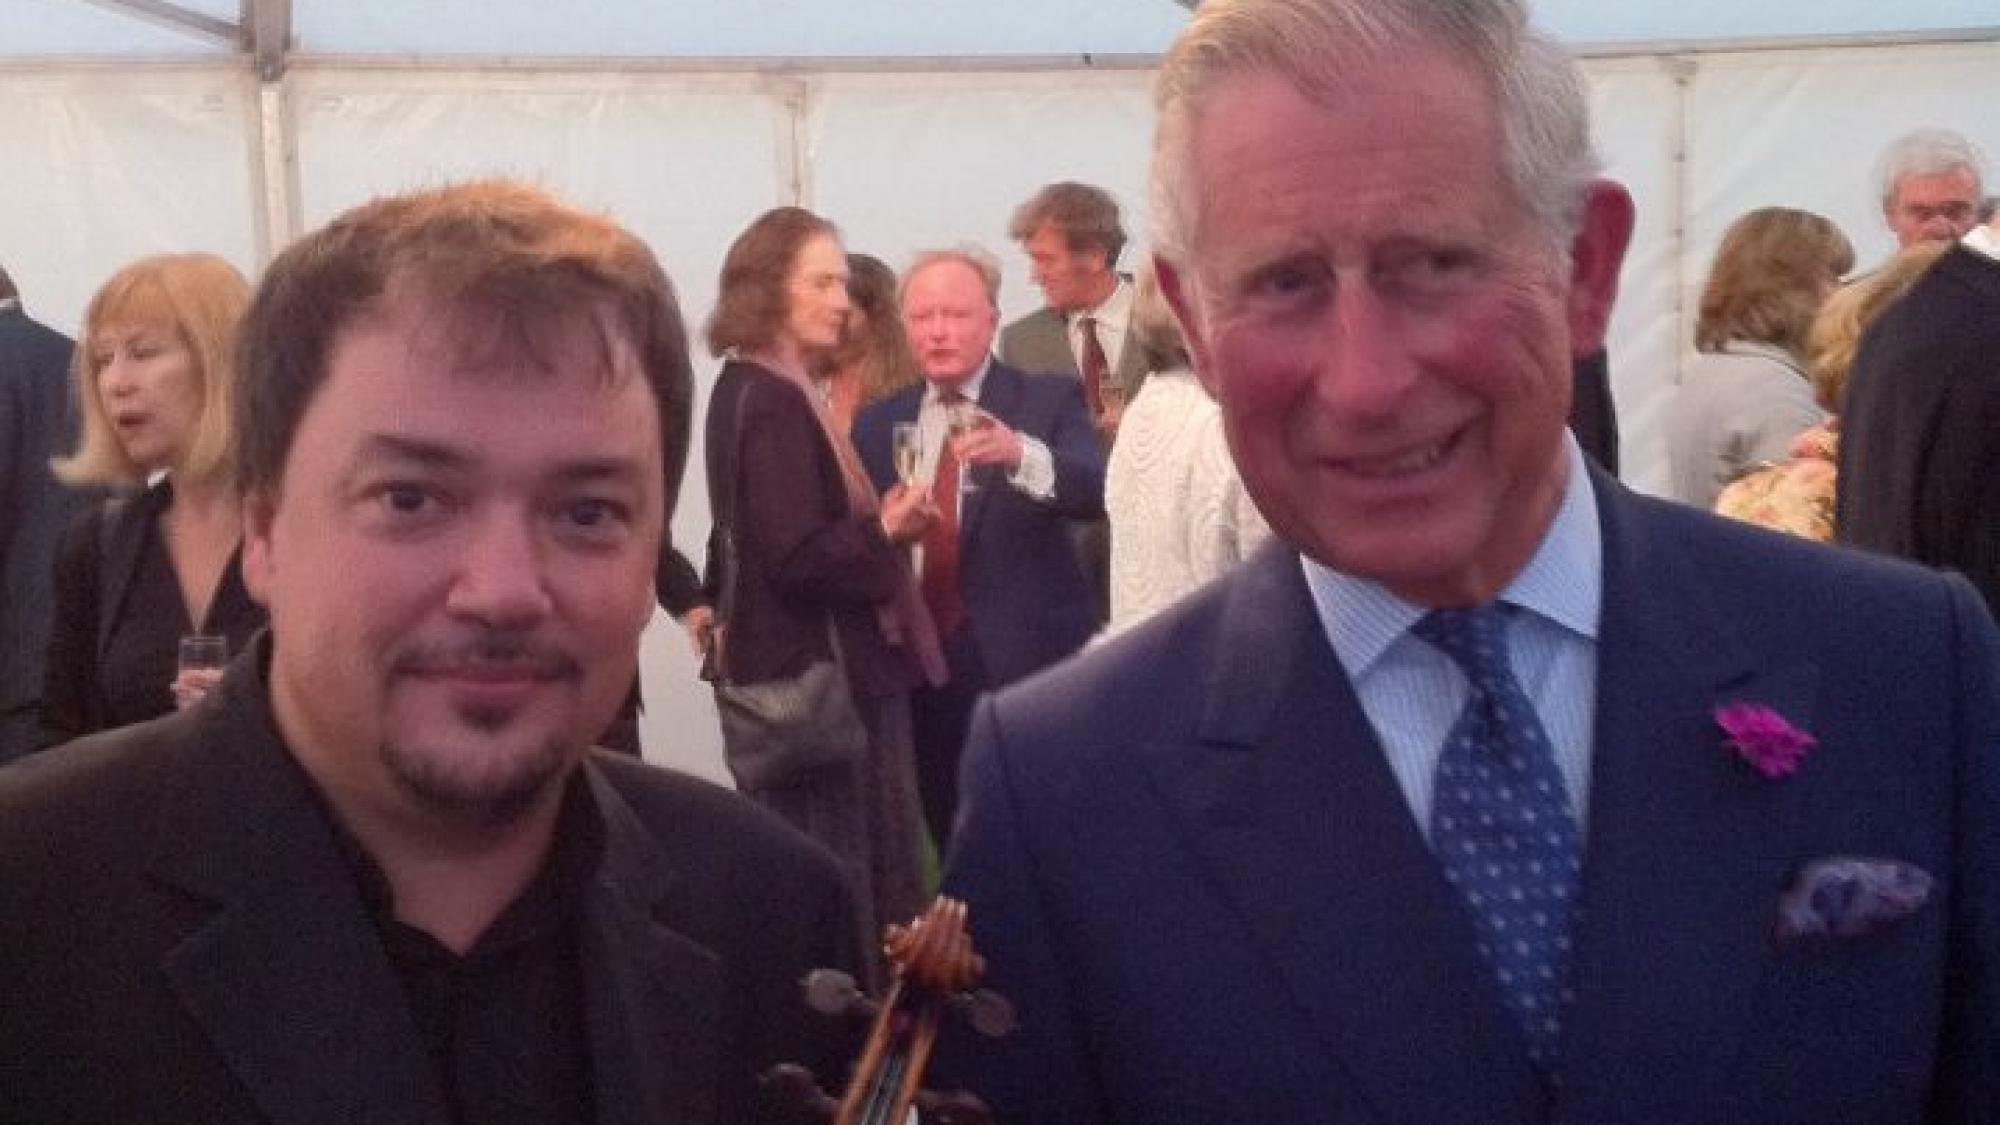 His-Royal-Highness-Prince-Charles-1